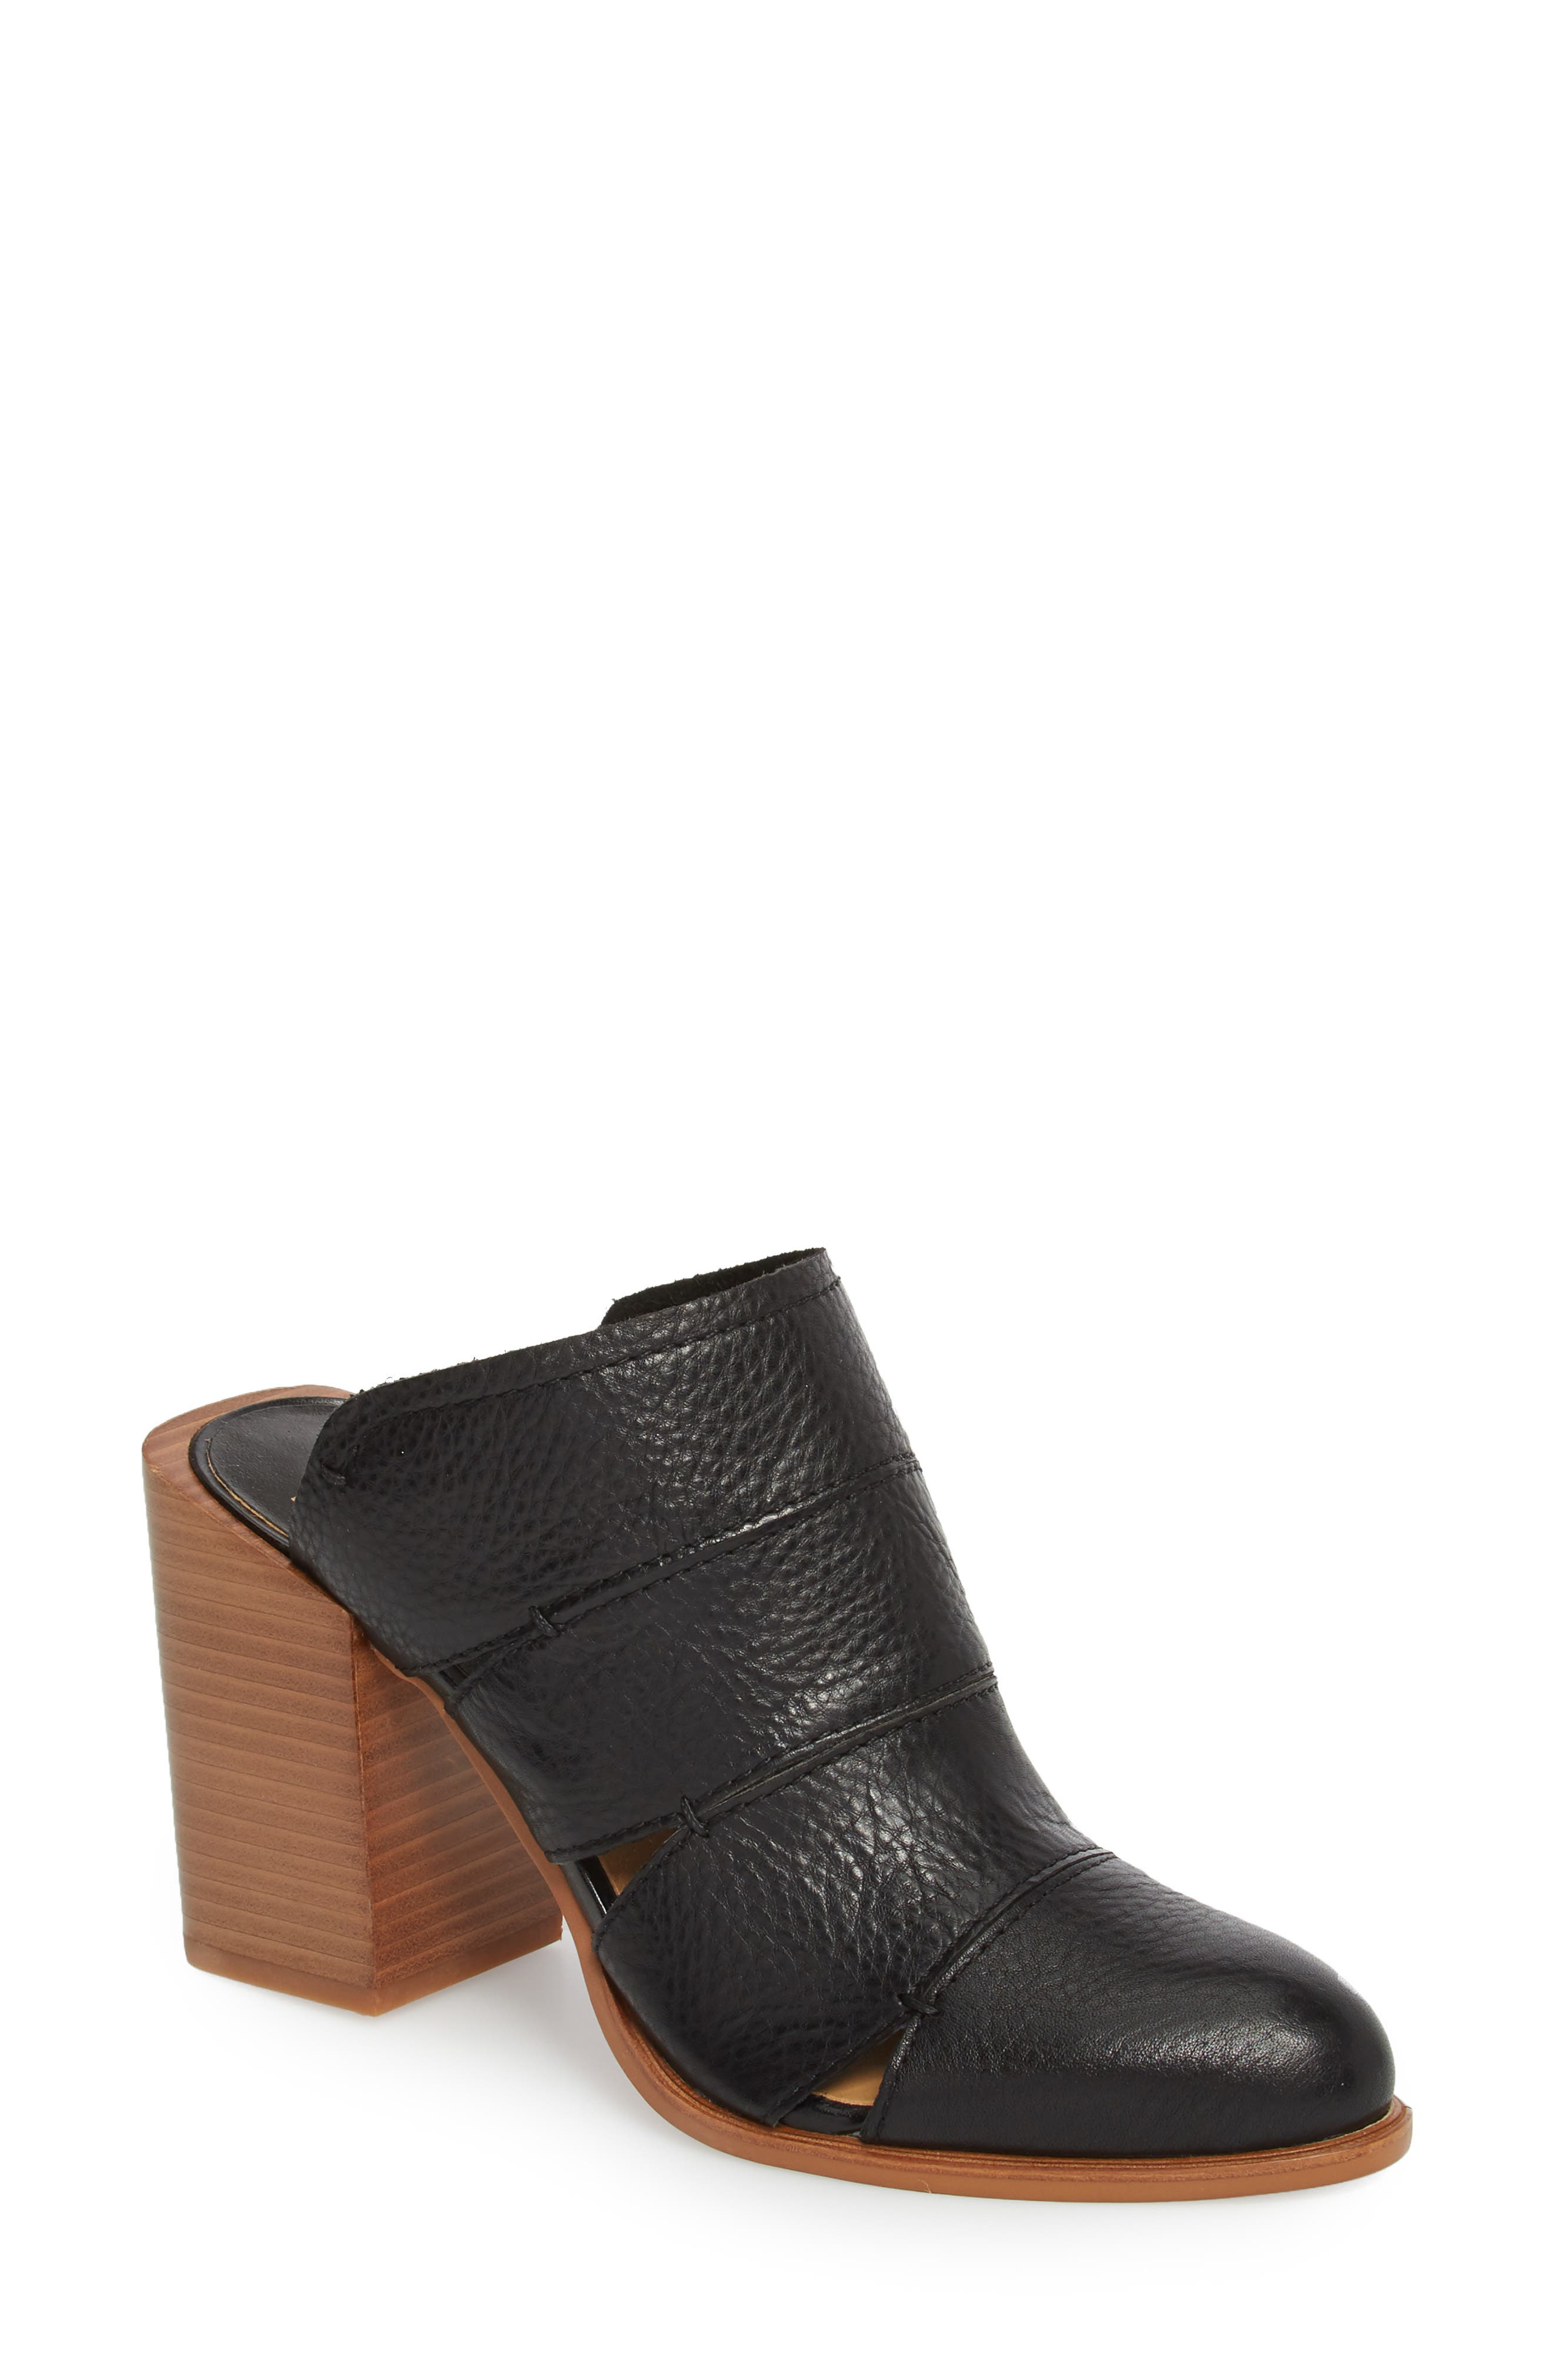 Makeo Mule,                         Main,                         color, Black Leather